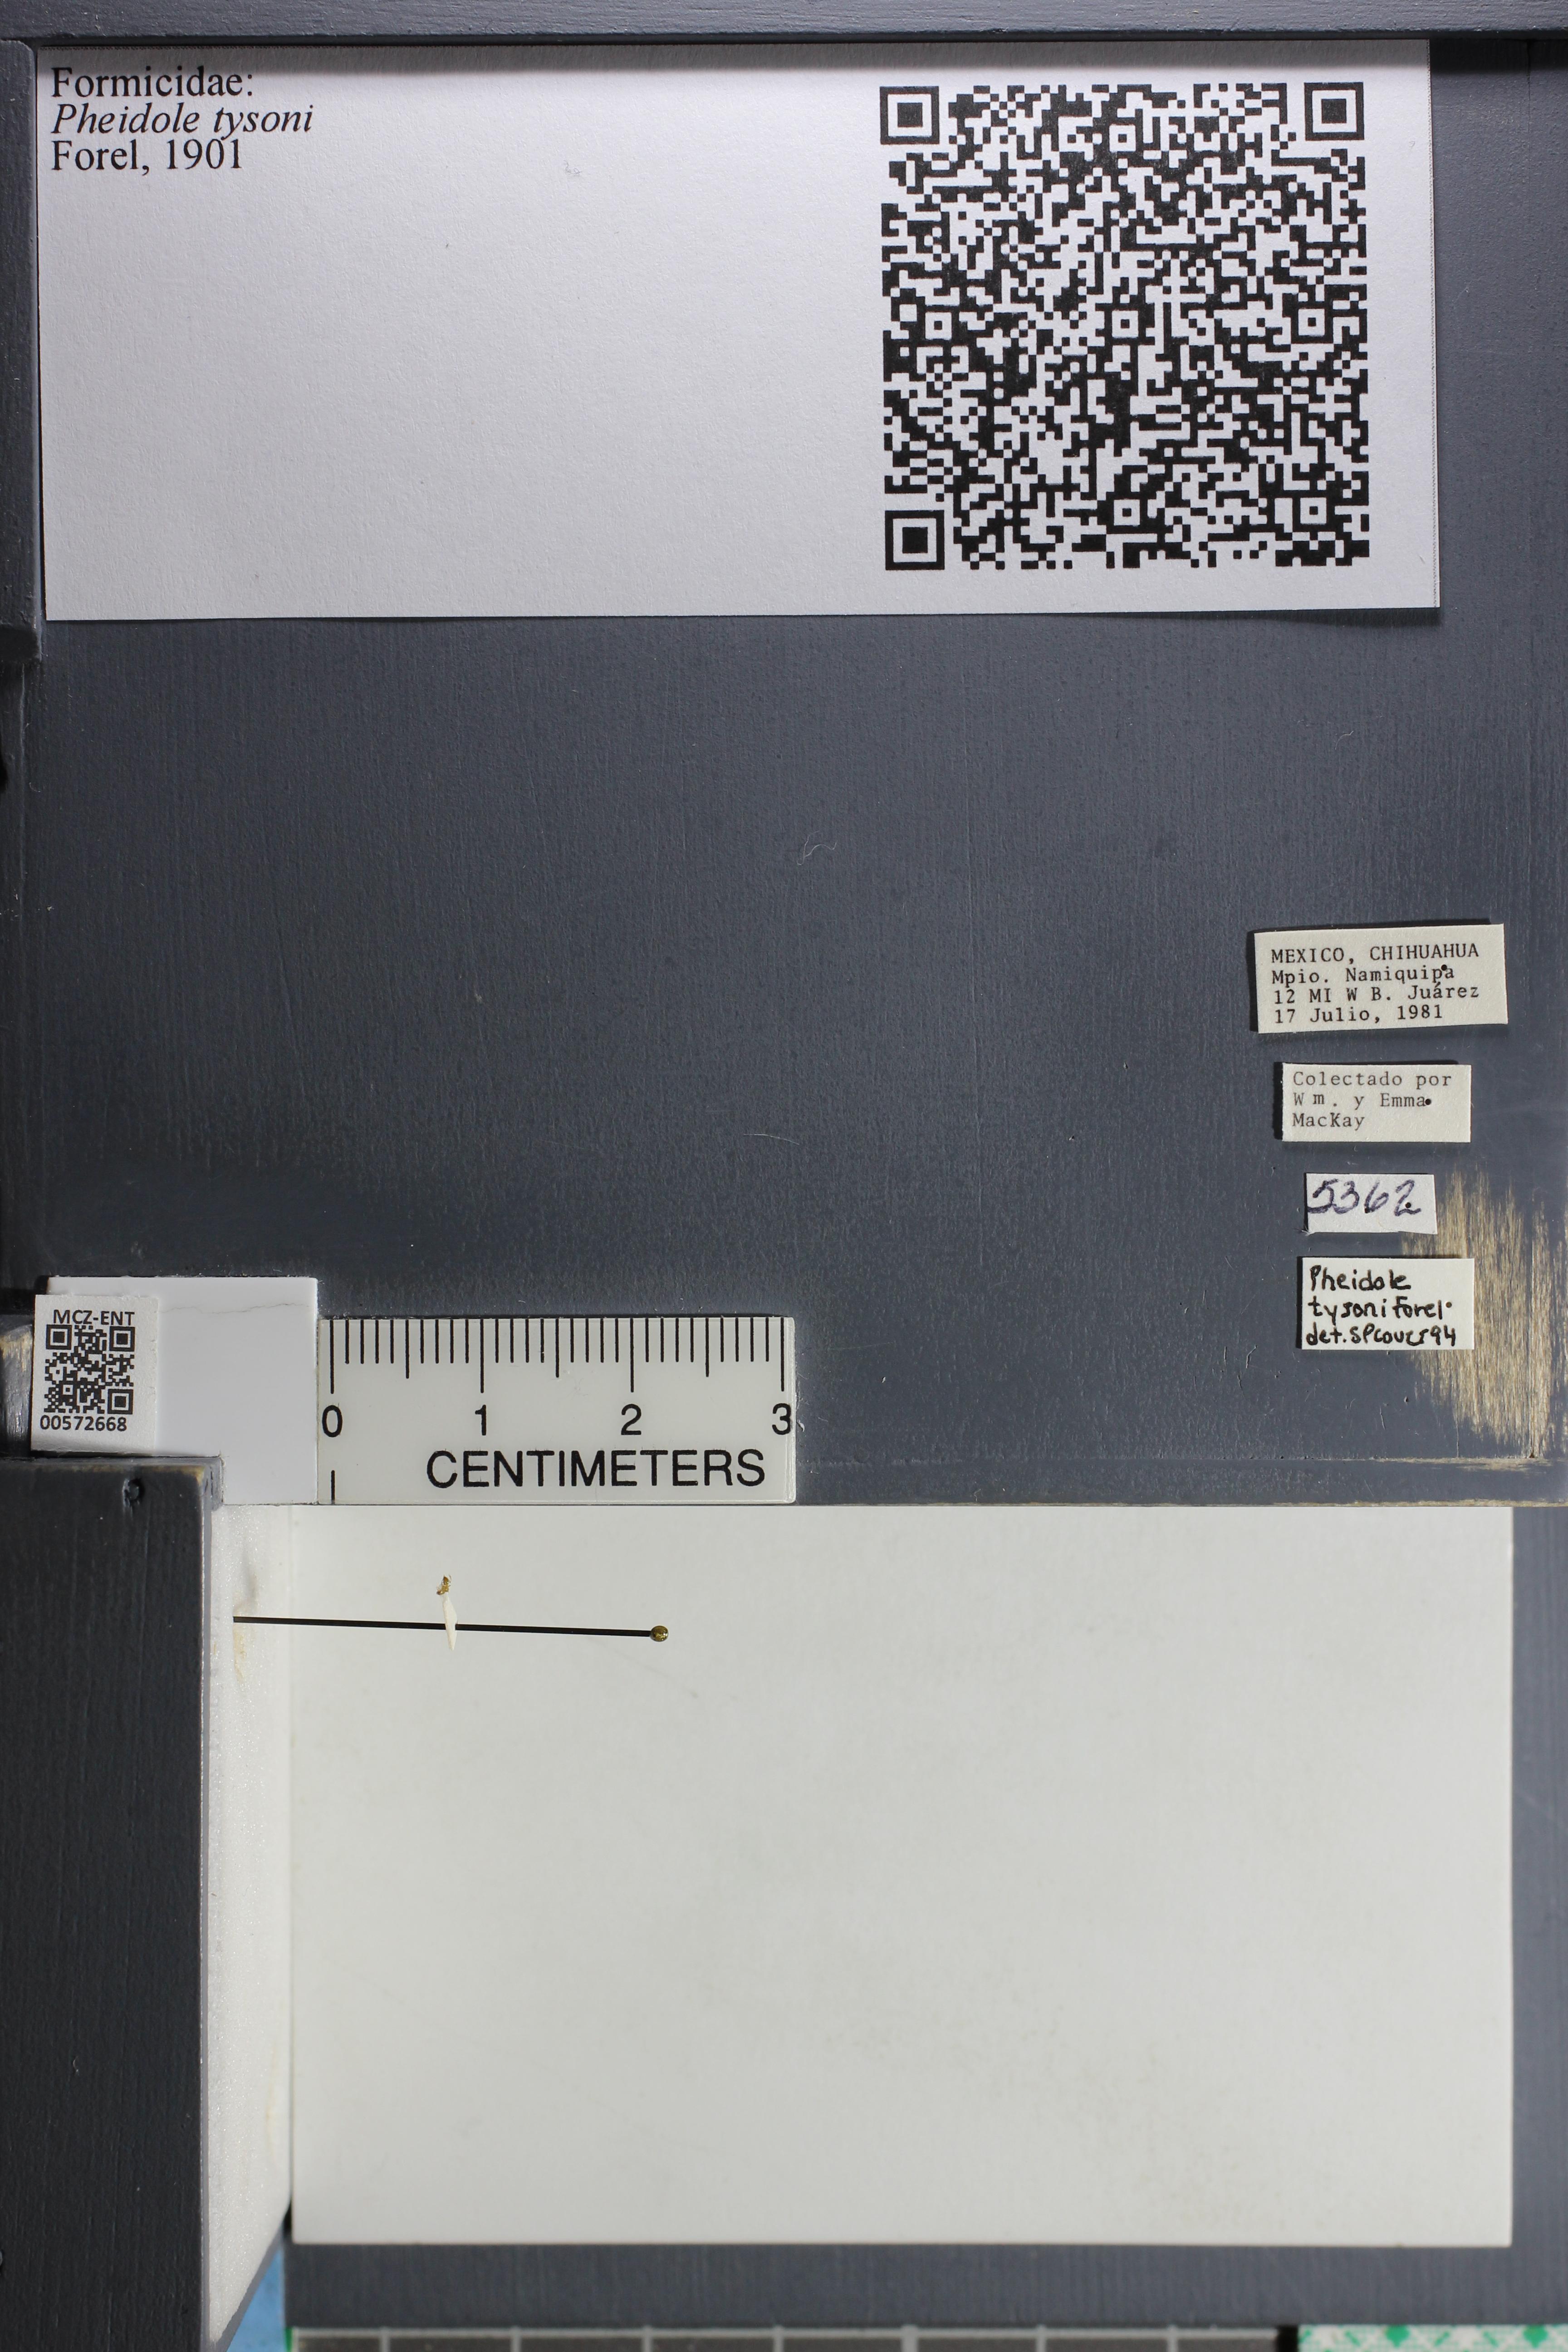 Media of type image, MCZ:Ent:572668 Identified as Pheidole tysoni.